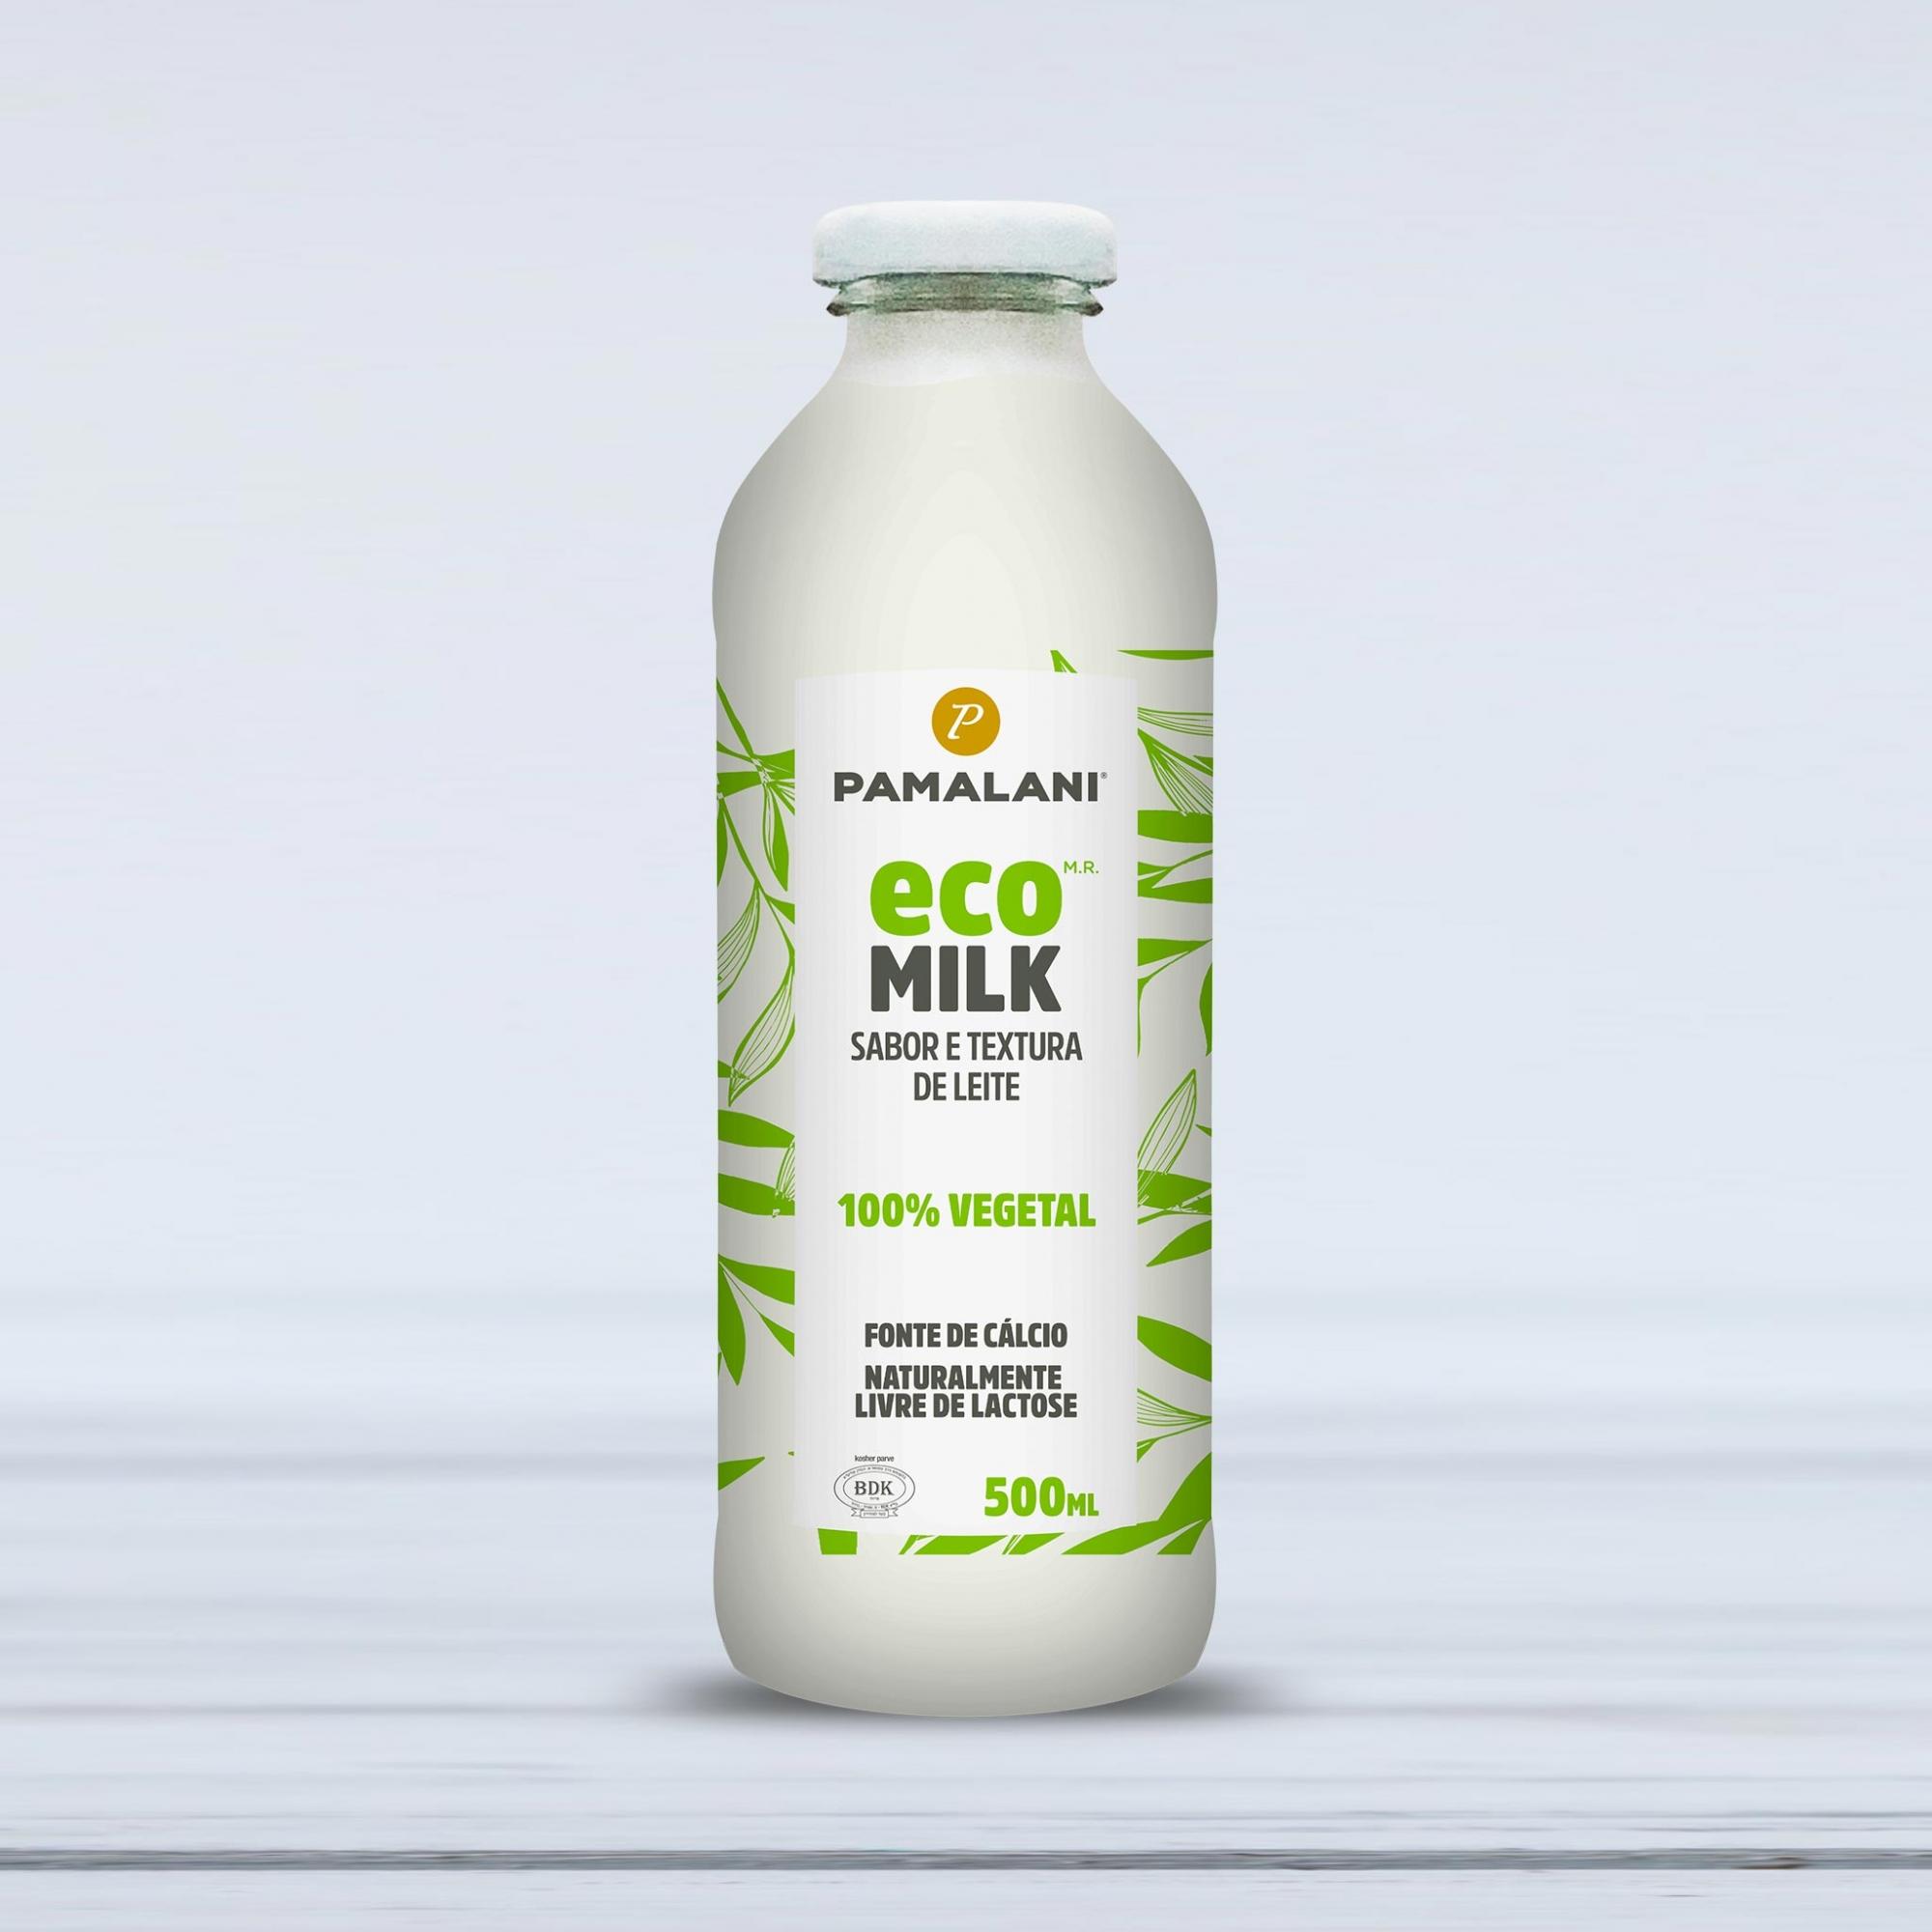 Eco Milk Sabor e Textura de Leite 100% vegetal 500ml